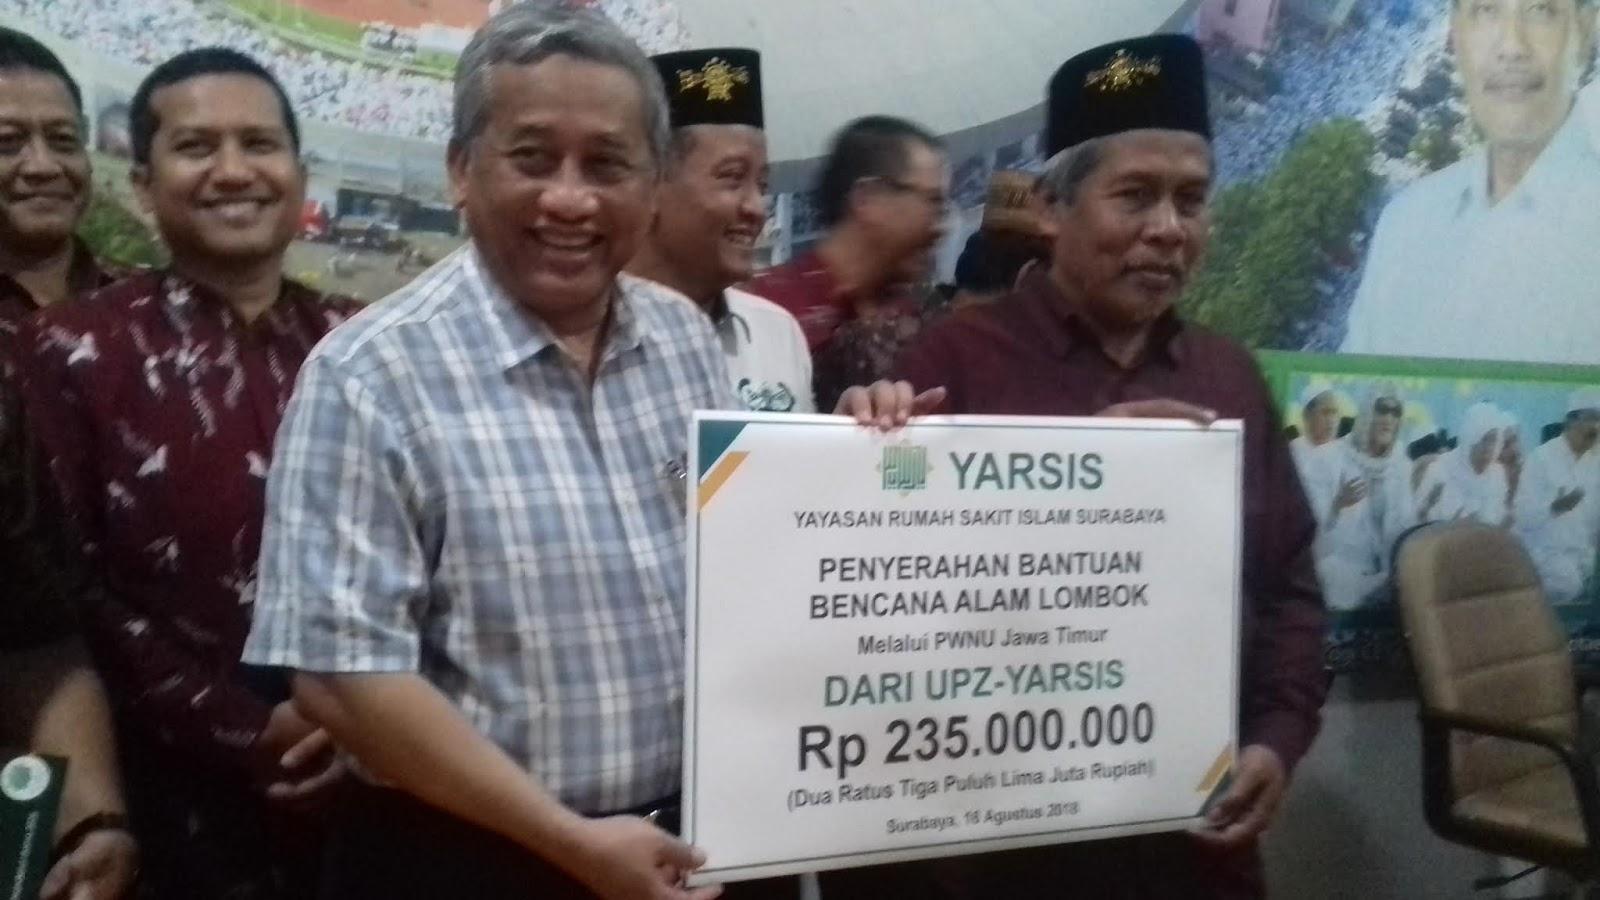 Yarsis Sumbang Korban Gempa Lombok Melalui Pwnu Jatim Media Rumah Untuk Surabaya Yayasan Sakit Islam Yang Membawahi Empat Unit Usaha Masing Universitas Nu Unusa